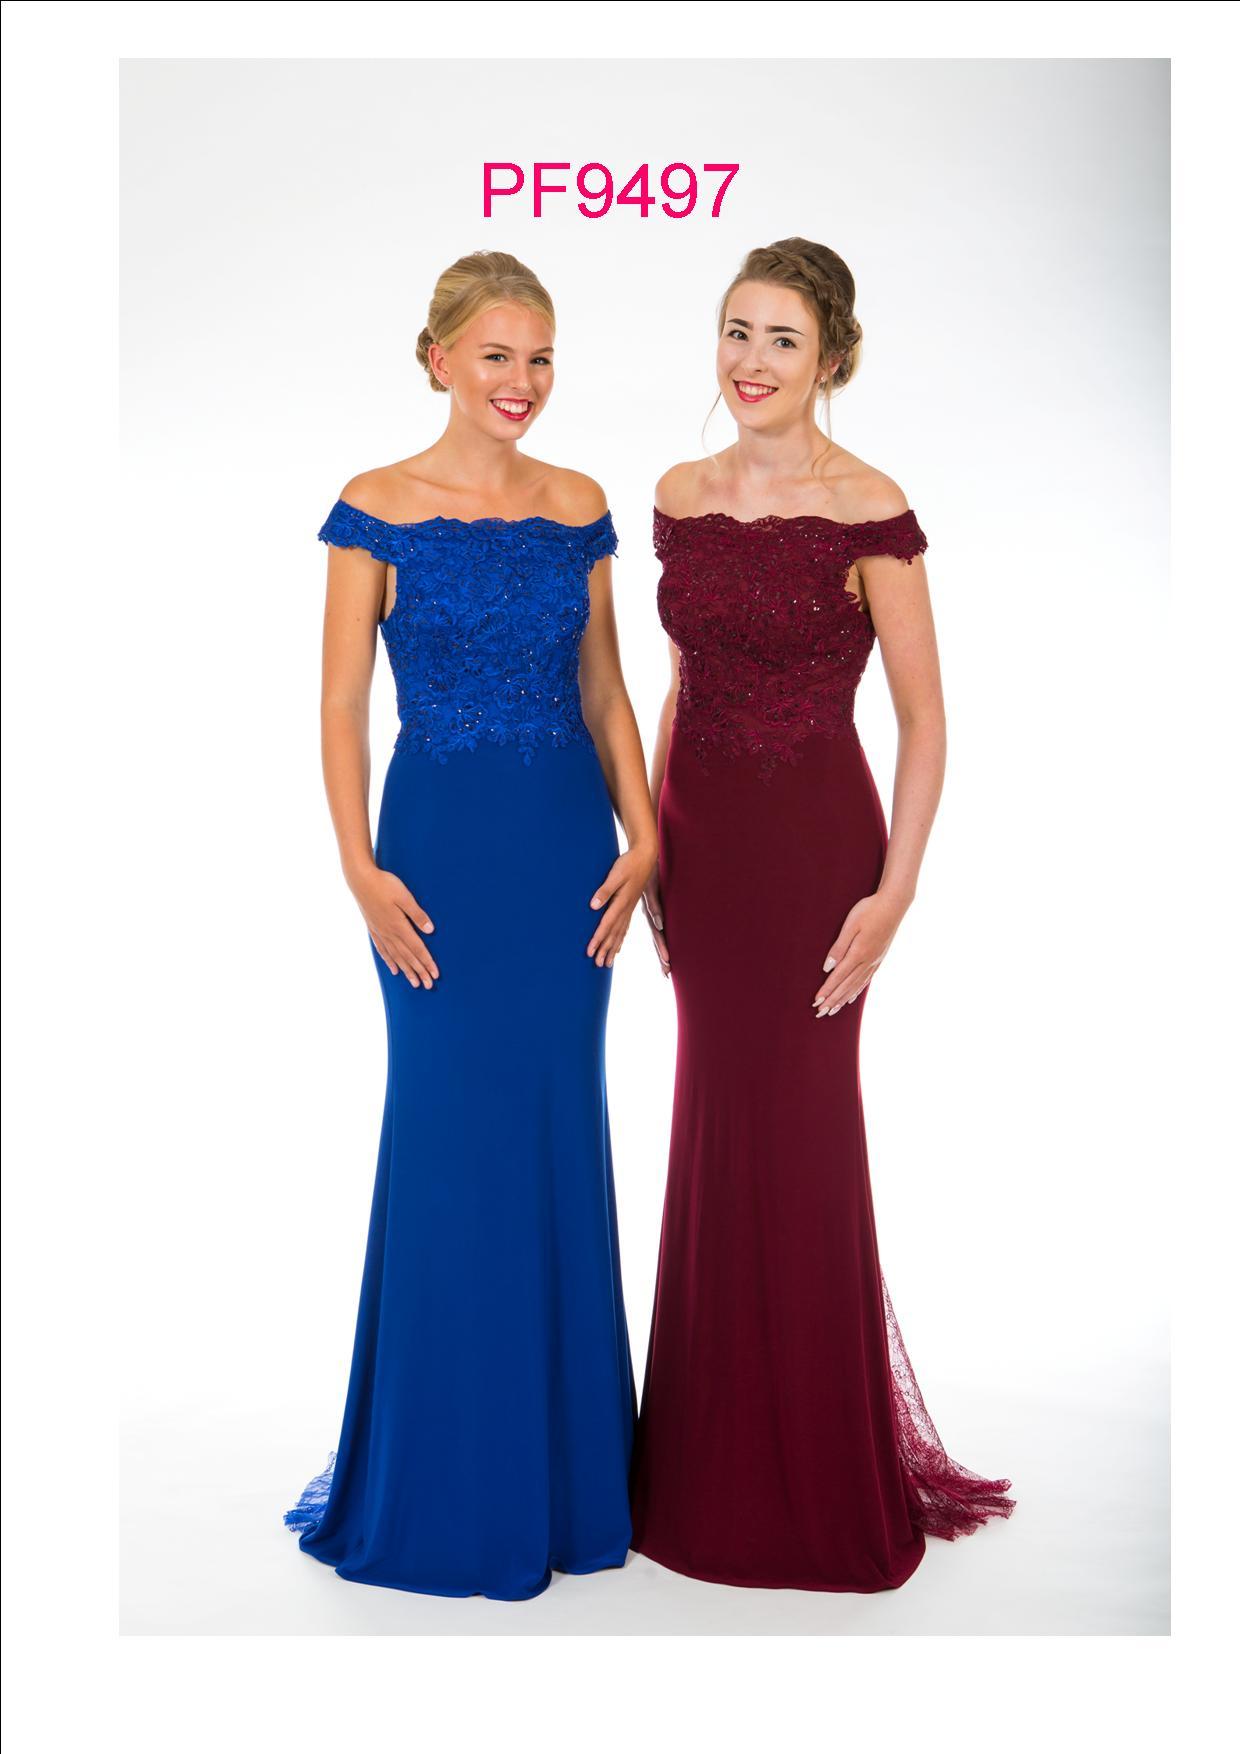 Pf9497 Royal Blue Prom Evening Dress Prom Frocks Uk Prom Dresses